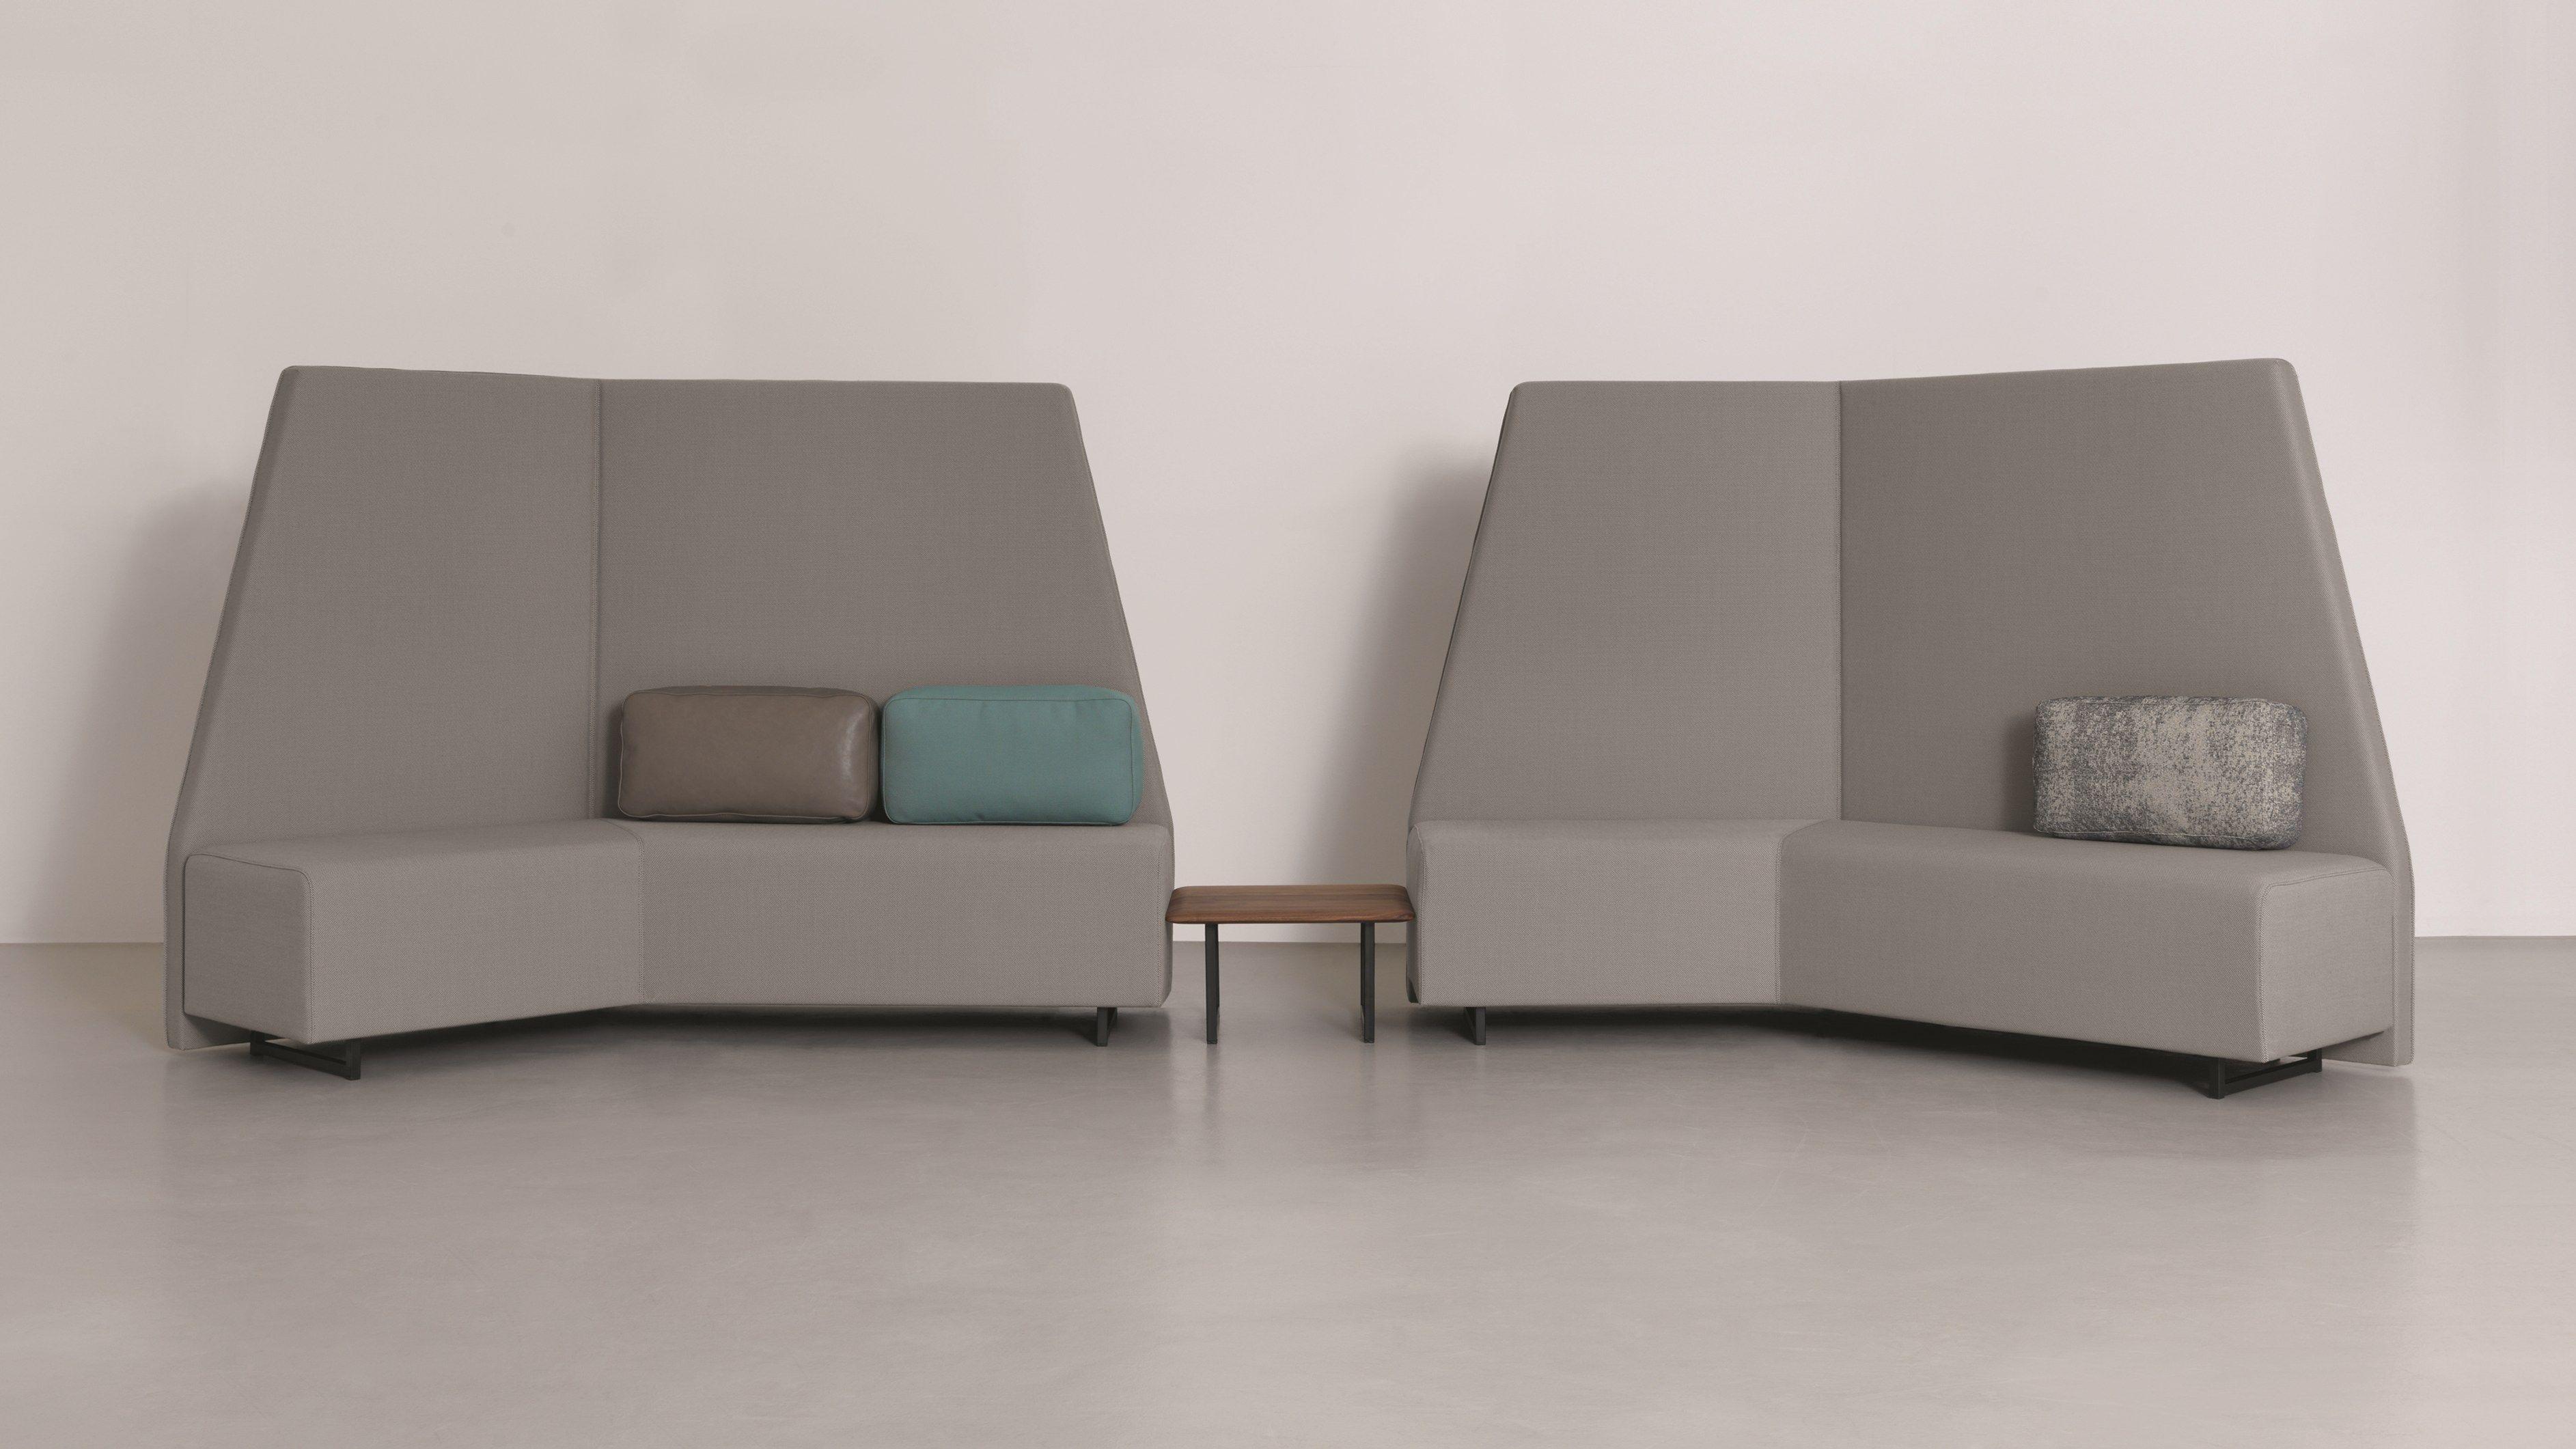 Sectional Upholstered High Back Sofa Side Comfort Backrest Side Comfort Collection By Zeitraum Design Formstelle Solid Wood Furniture Furniture Sofa Design